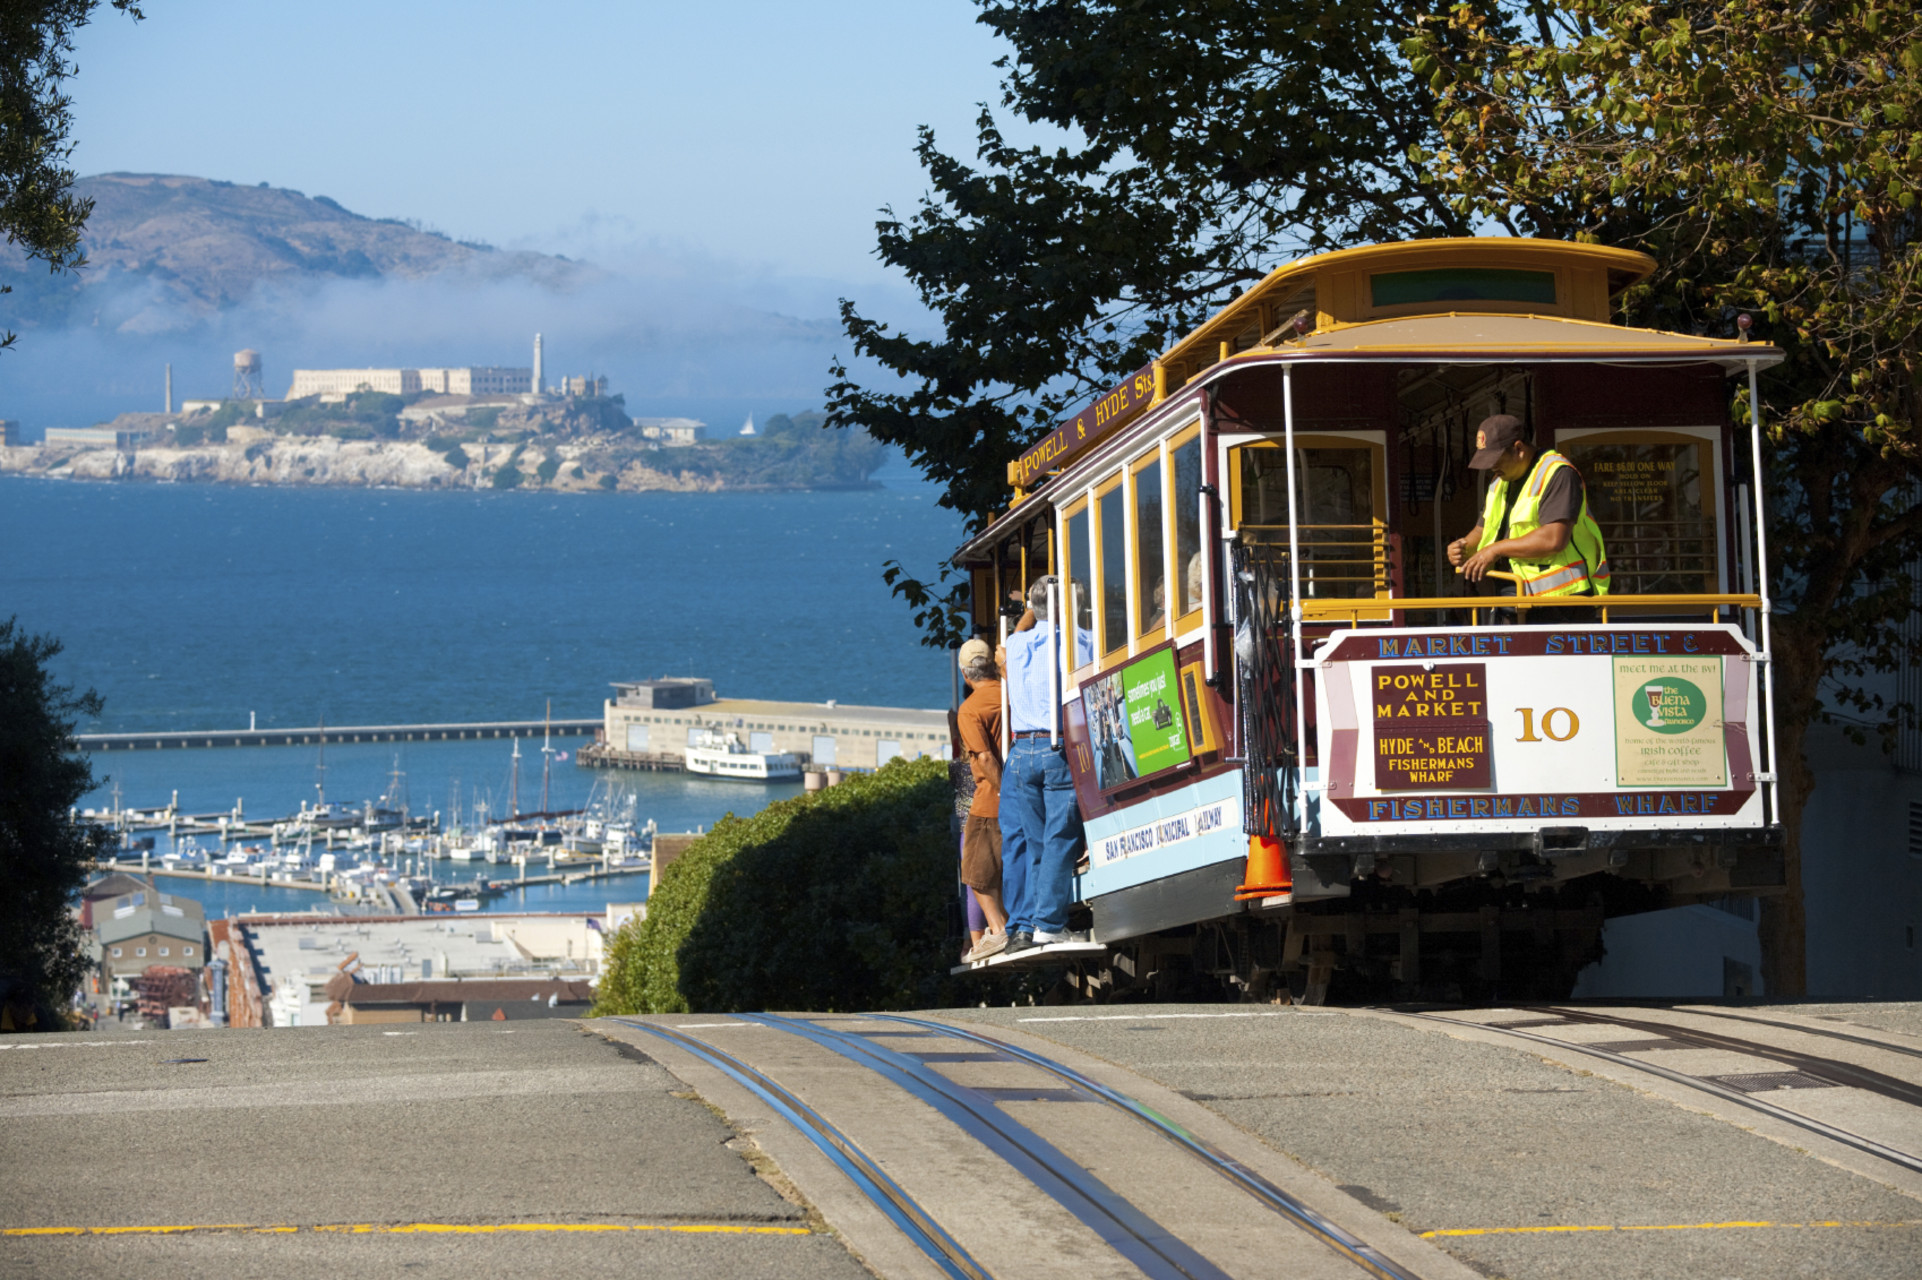 Tranvía_en_San_Francisco